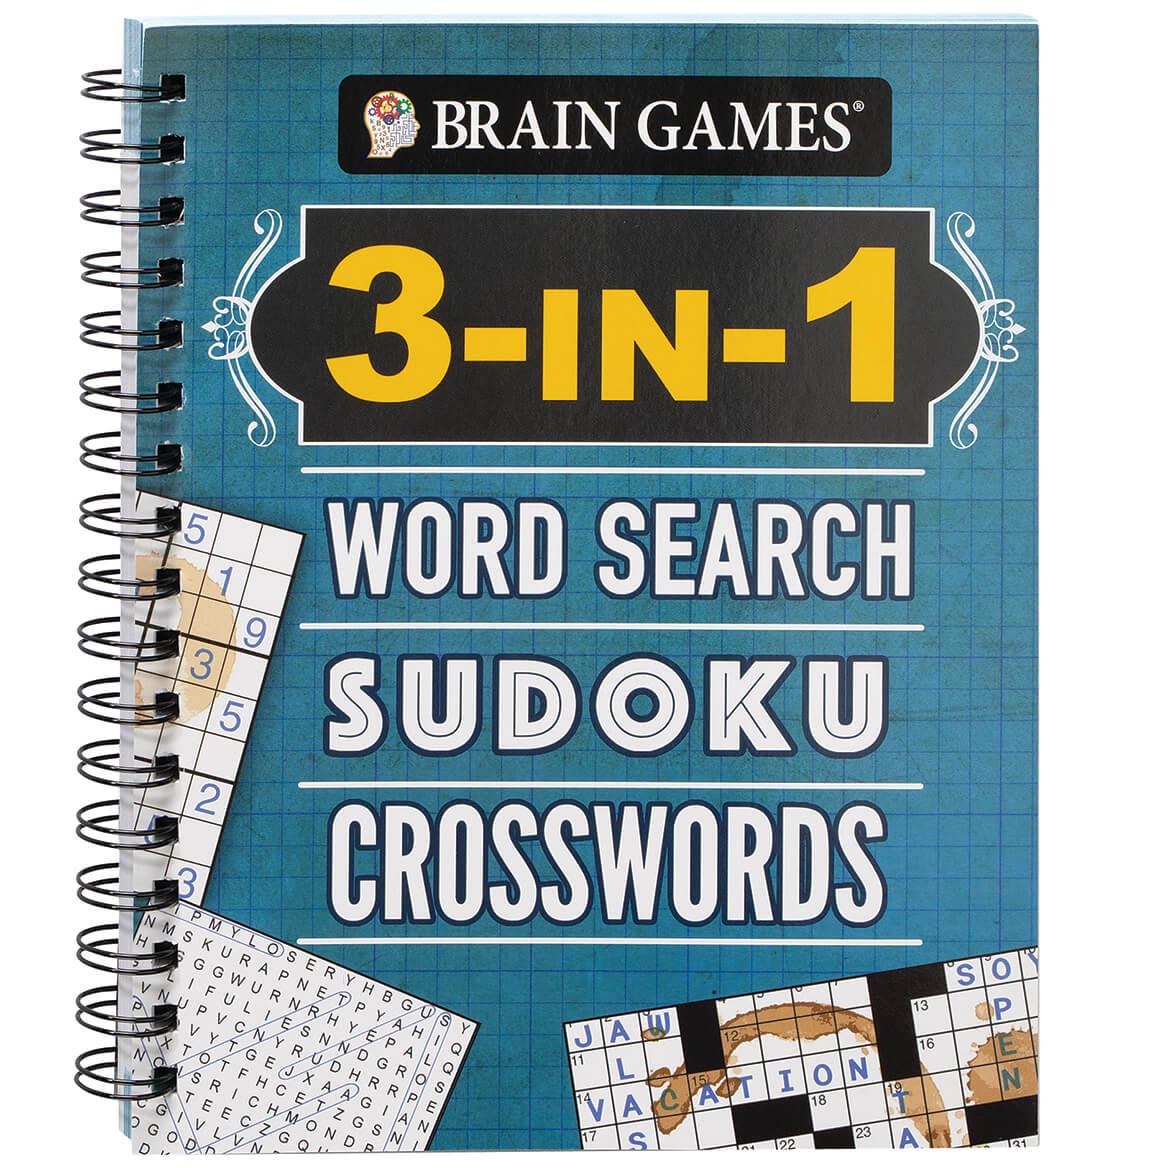 Brain Games® 3-in-1 Word Search, Sudoku, Crosswords Book-371344